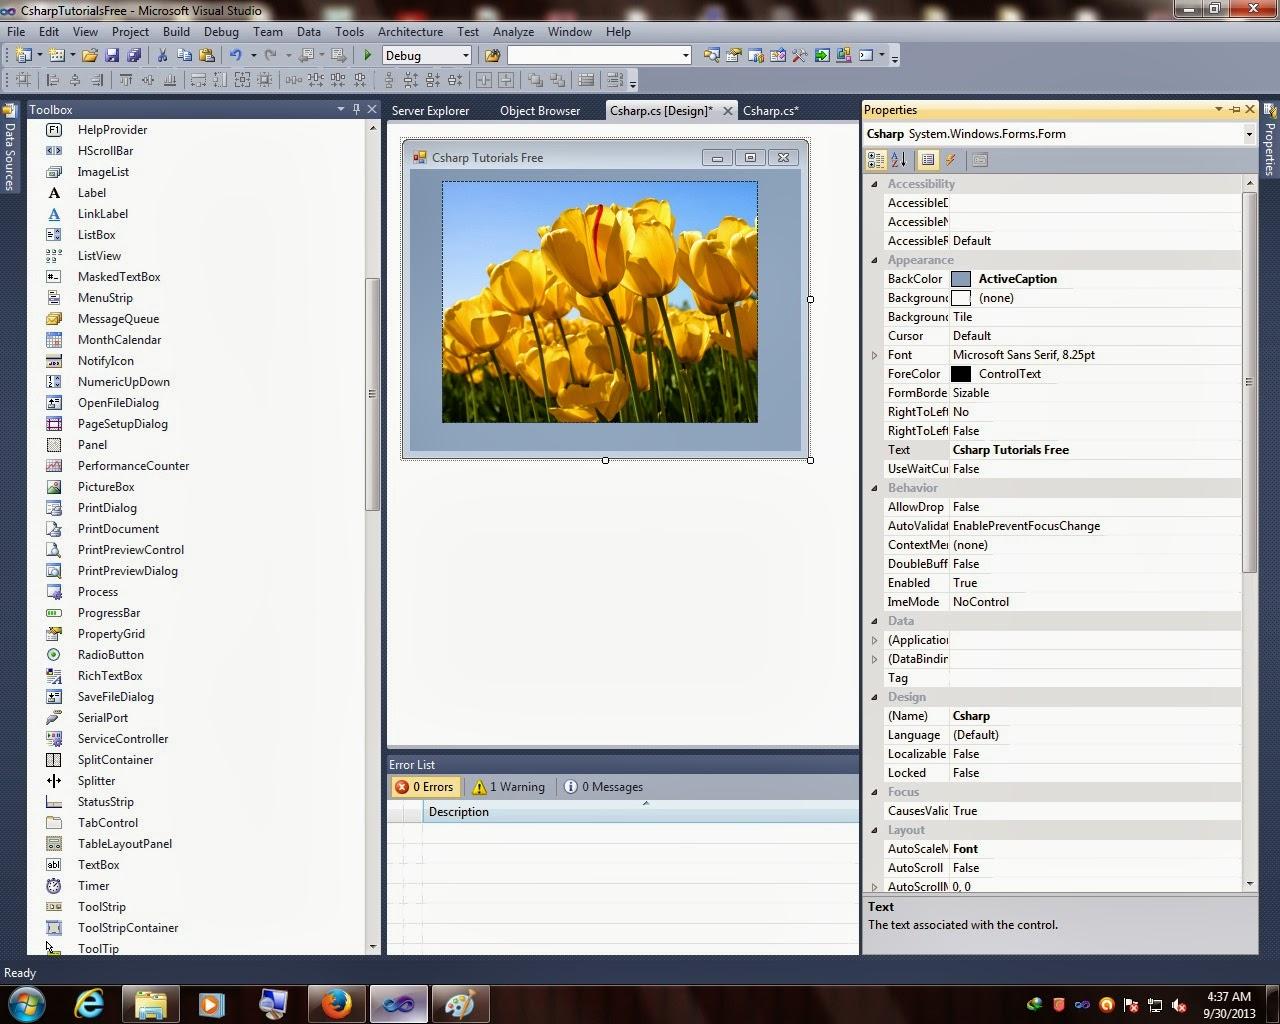 C sharp form background image - C Sharp Form Background Image 33